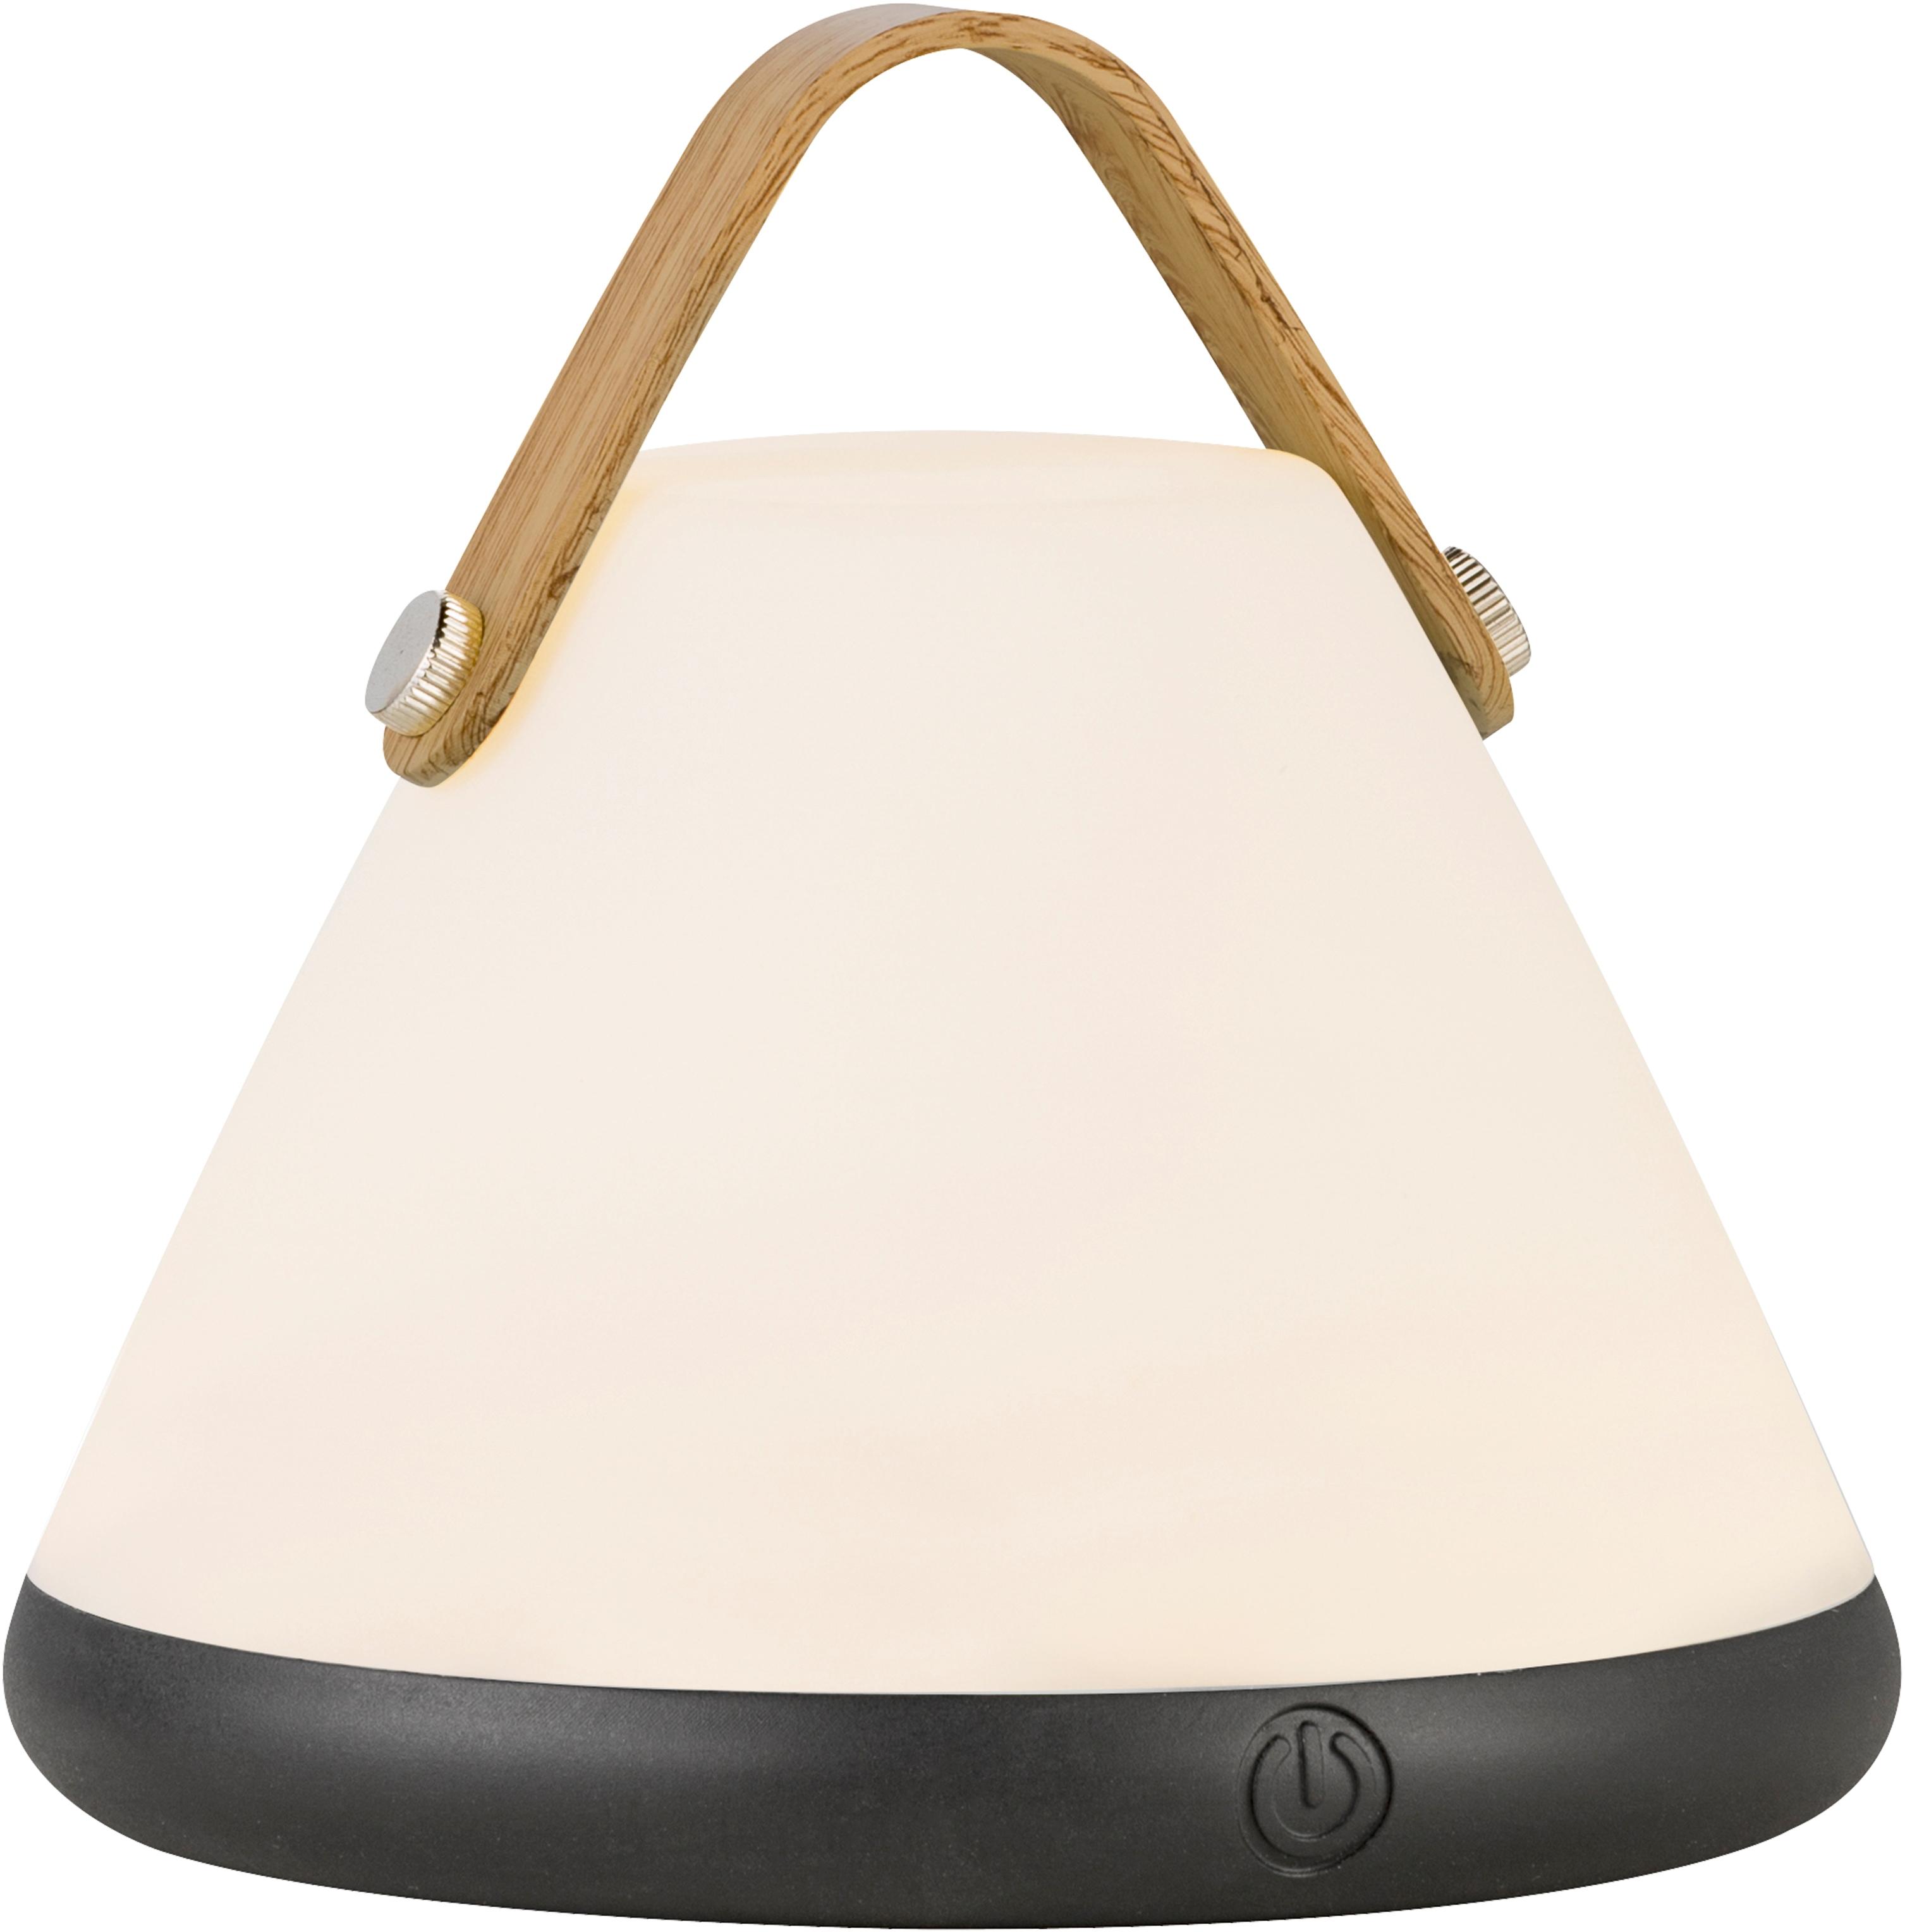 design for the people LED Tischleuchte STRAP, LED-Modul, Portable LED Leuchte, inkl. LED und Dimmer